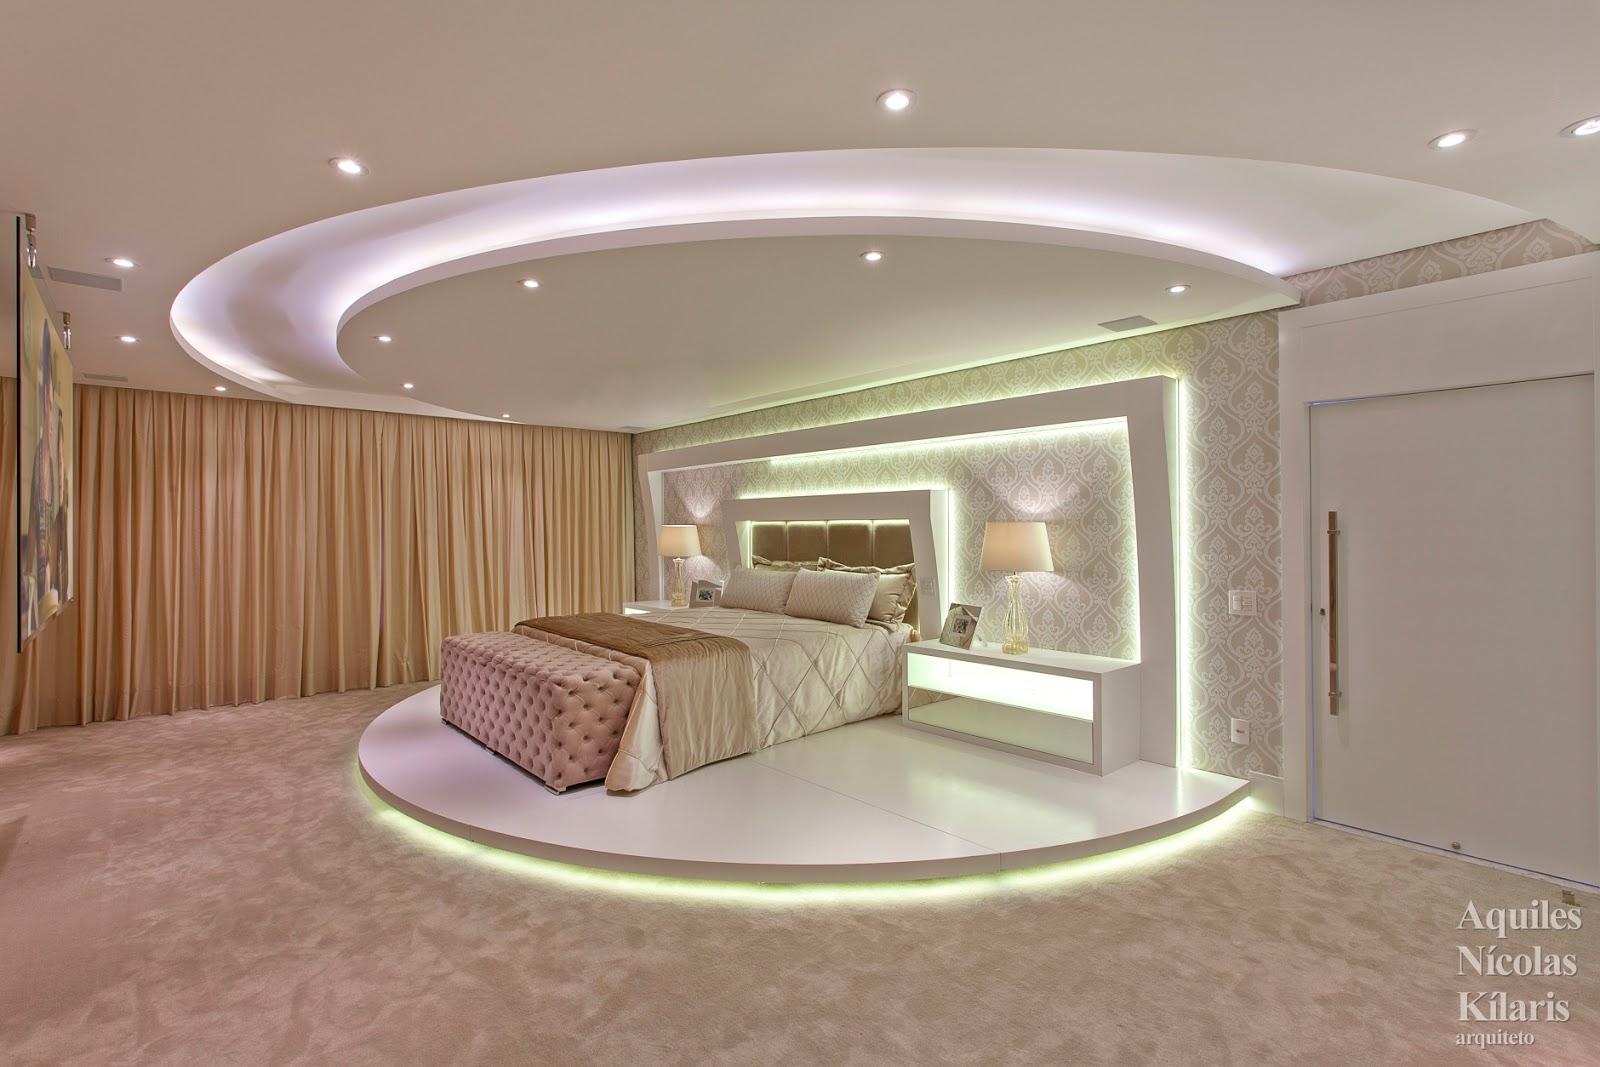 enchanting bedroom decorating inspiration photos | Inside Footballer House, Brazil - Spectacular Interiors ...